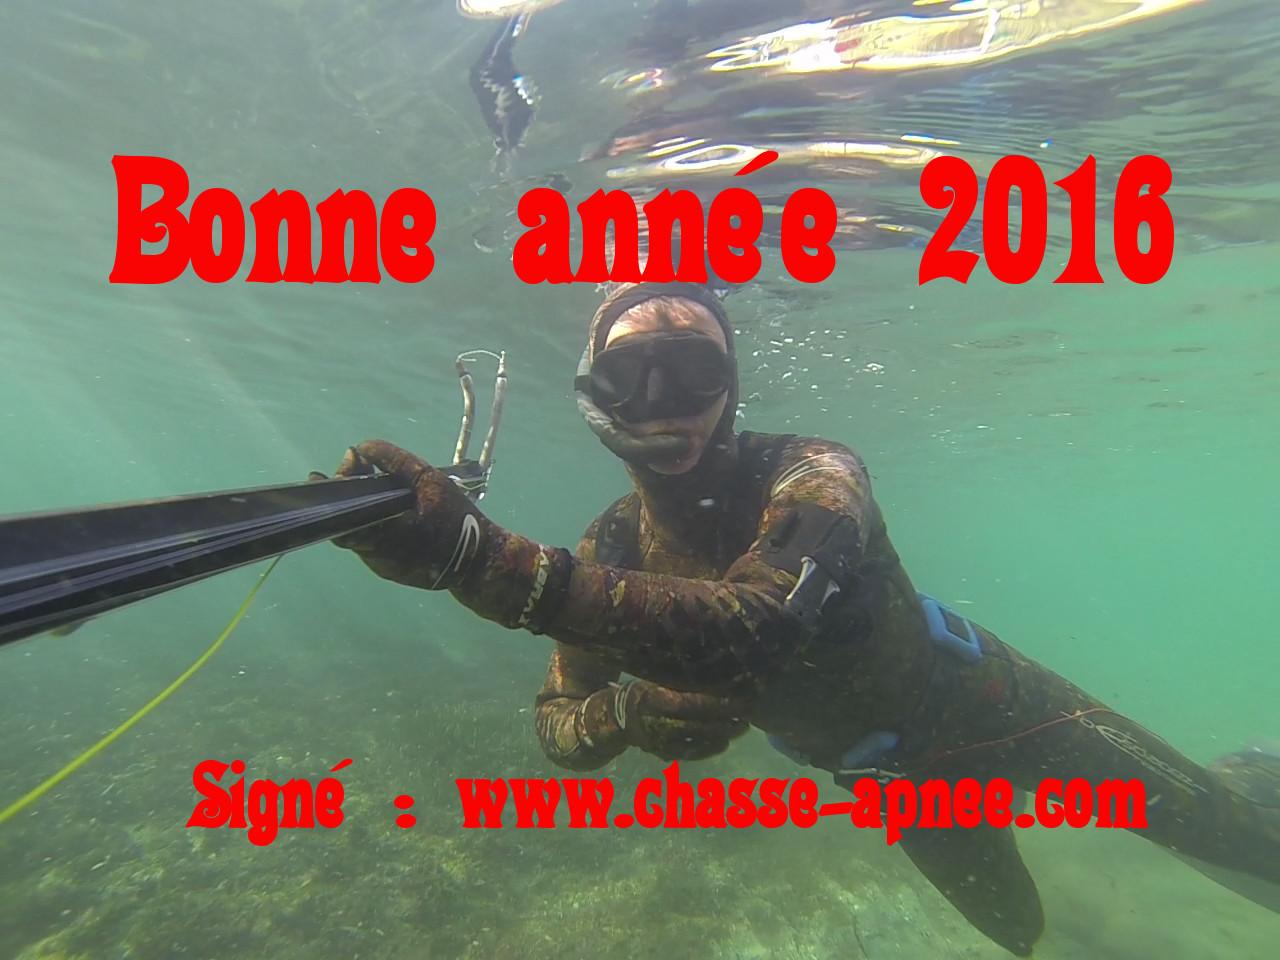 bilan chasse sous-marine 2016